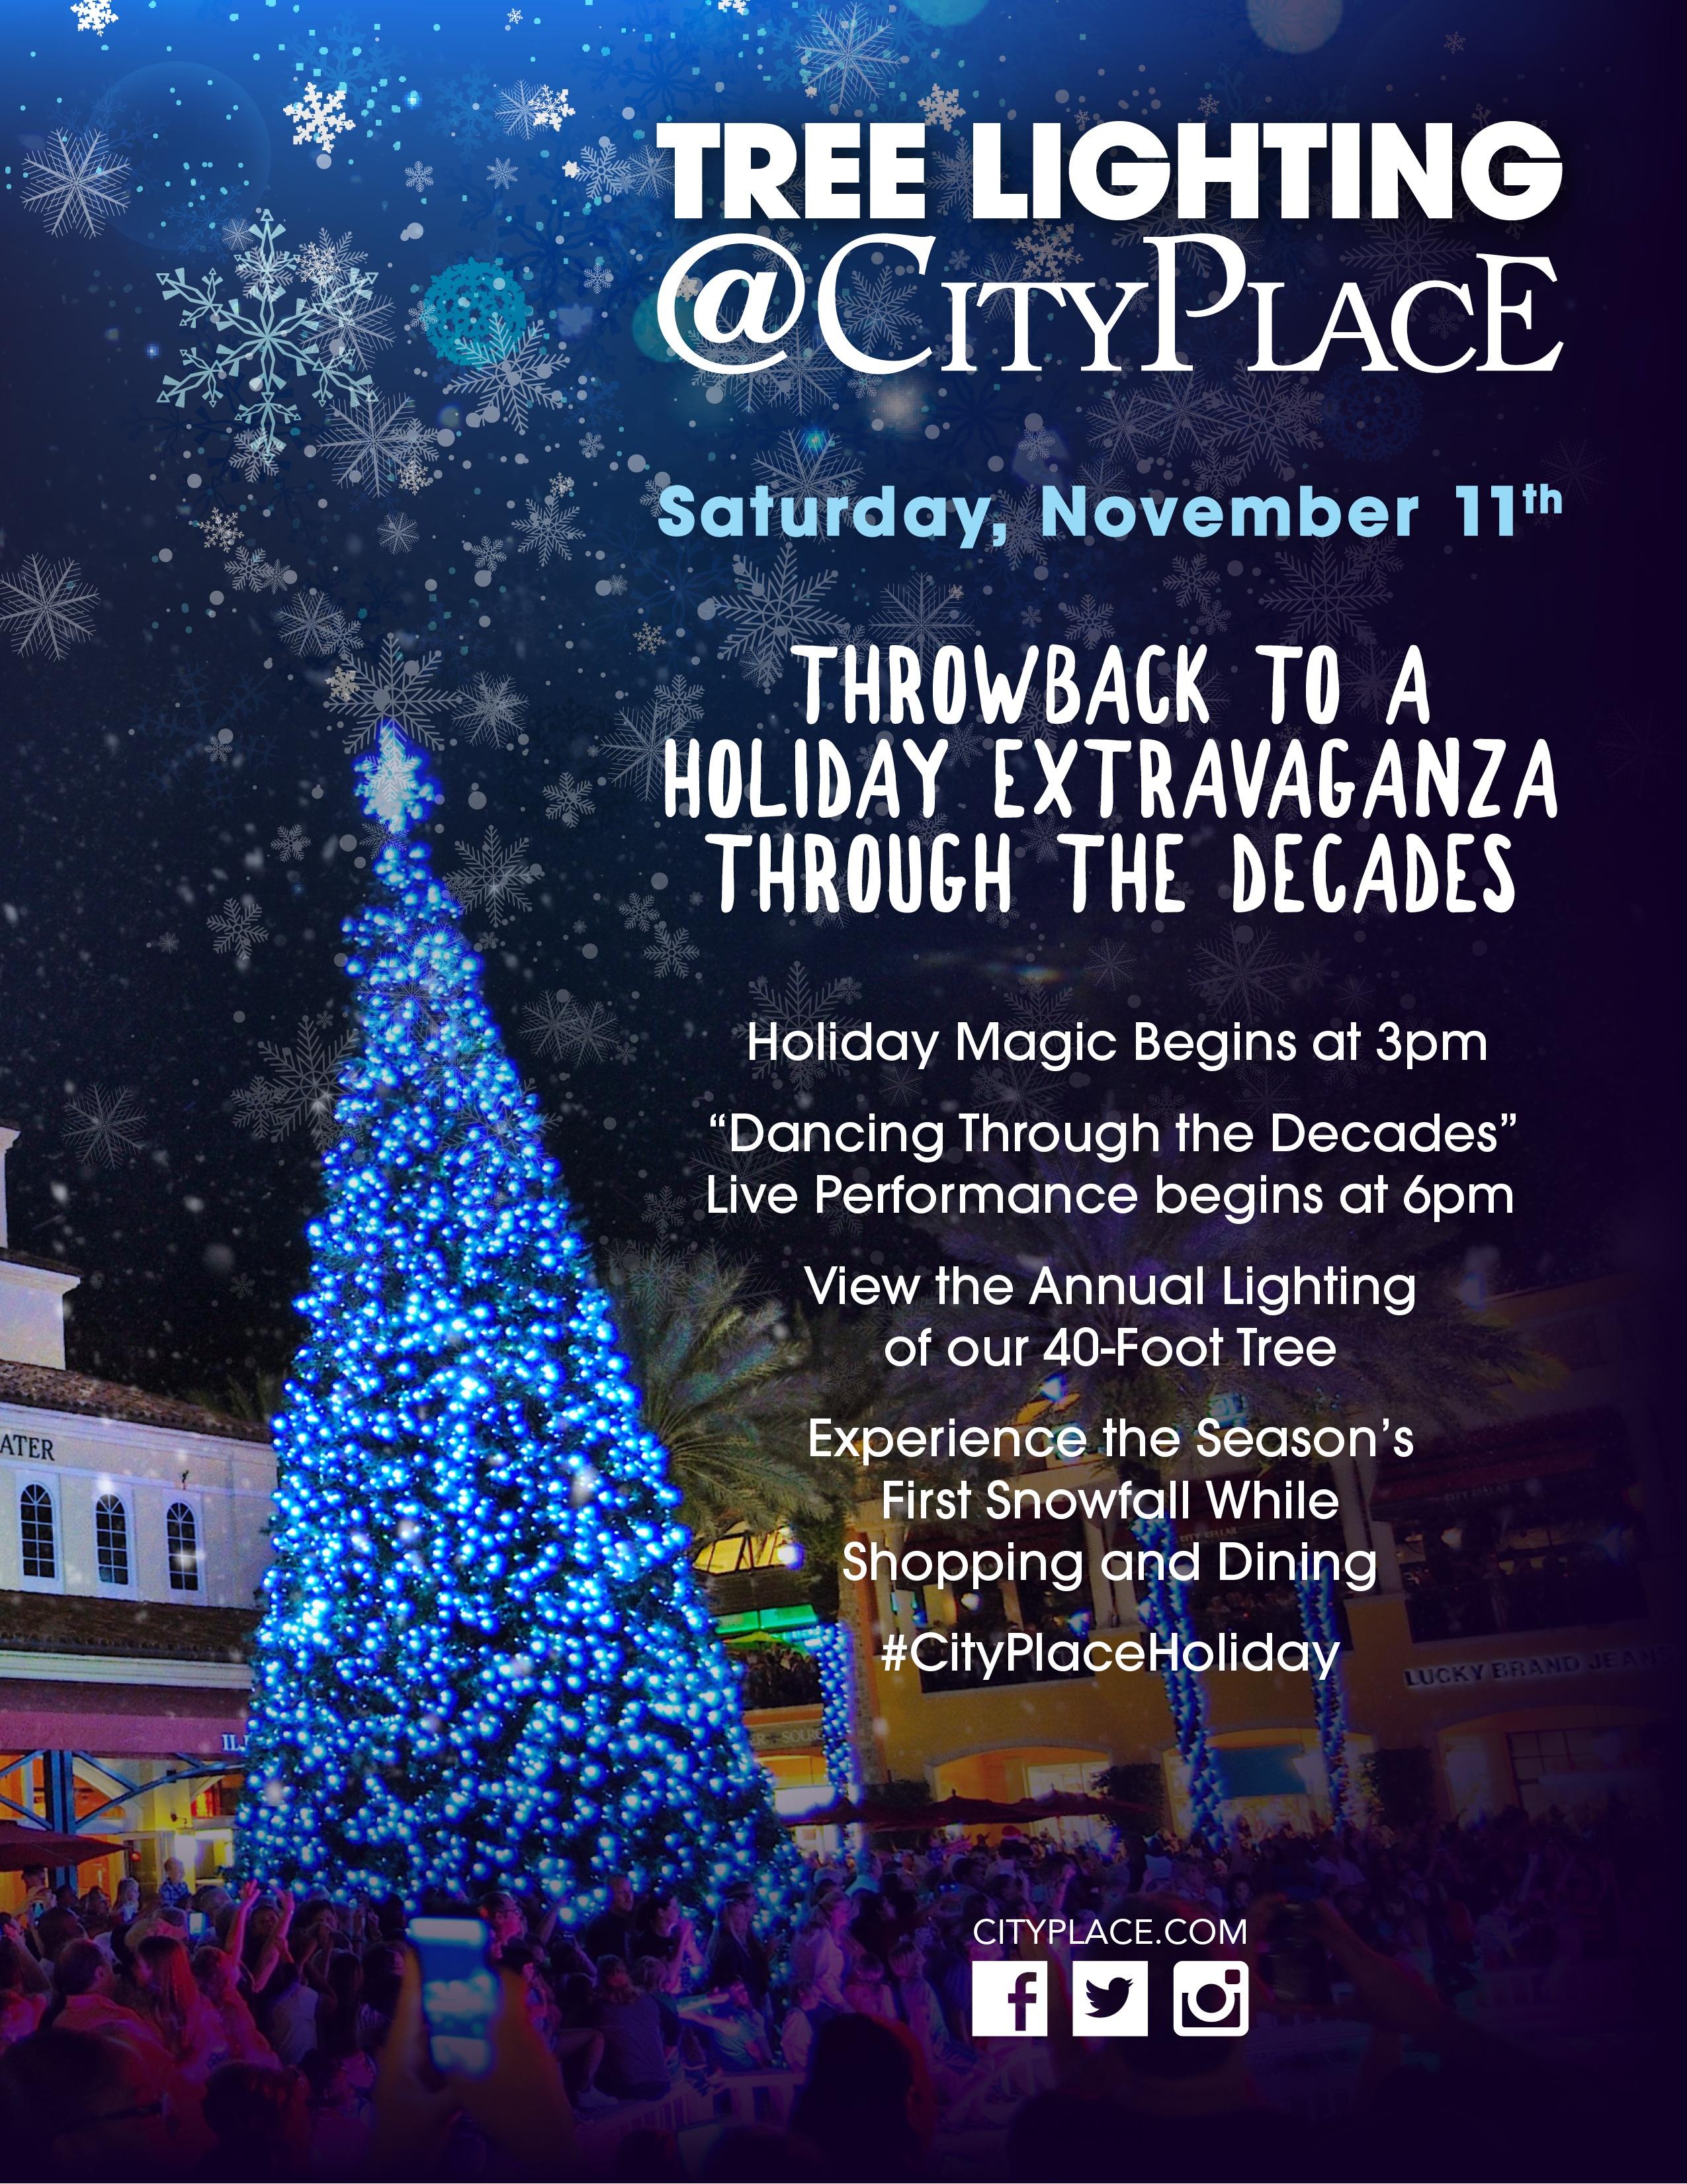 CityPlace_Tree_Lighting_2017_8BDx11.jpg